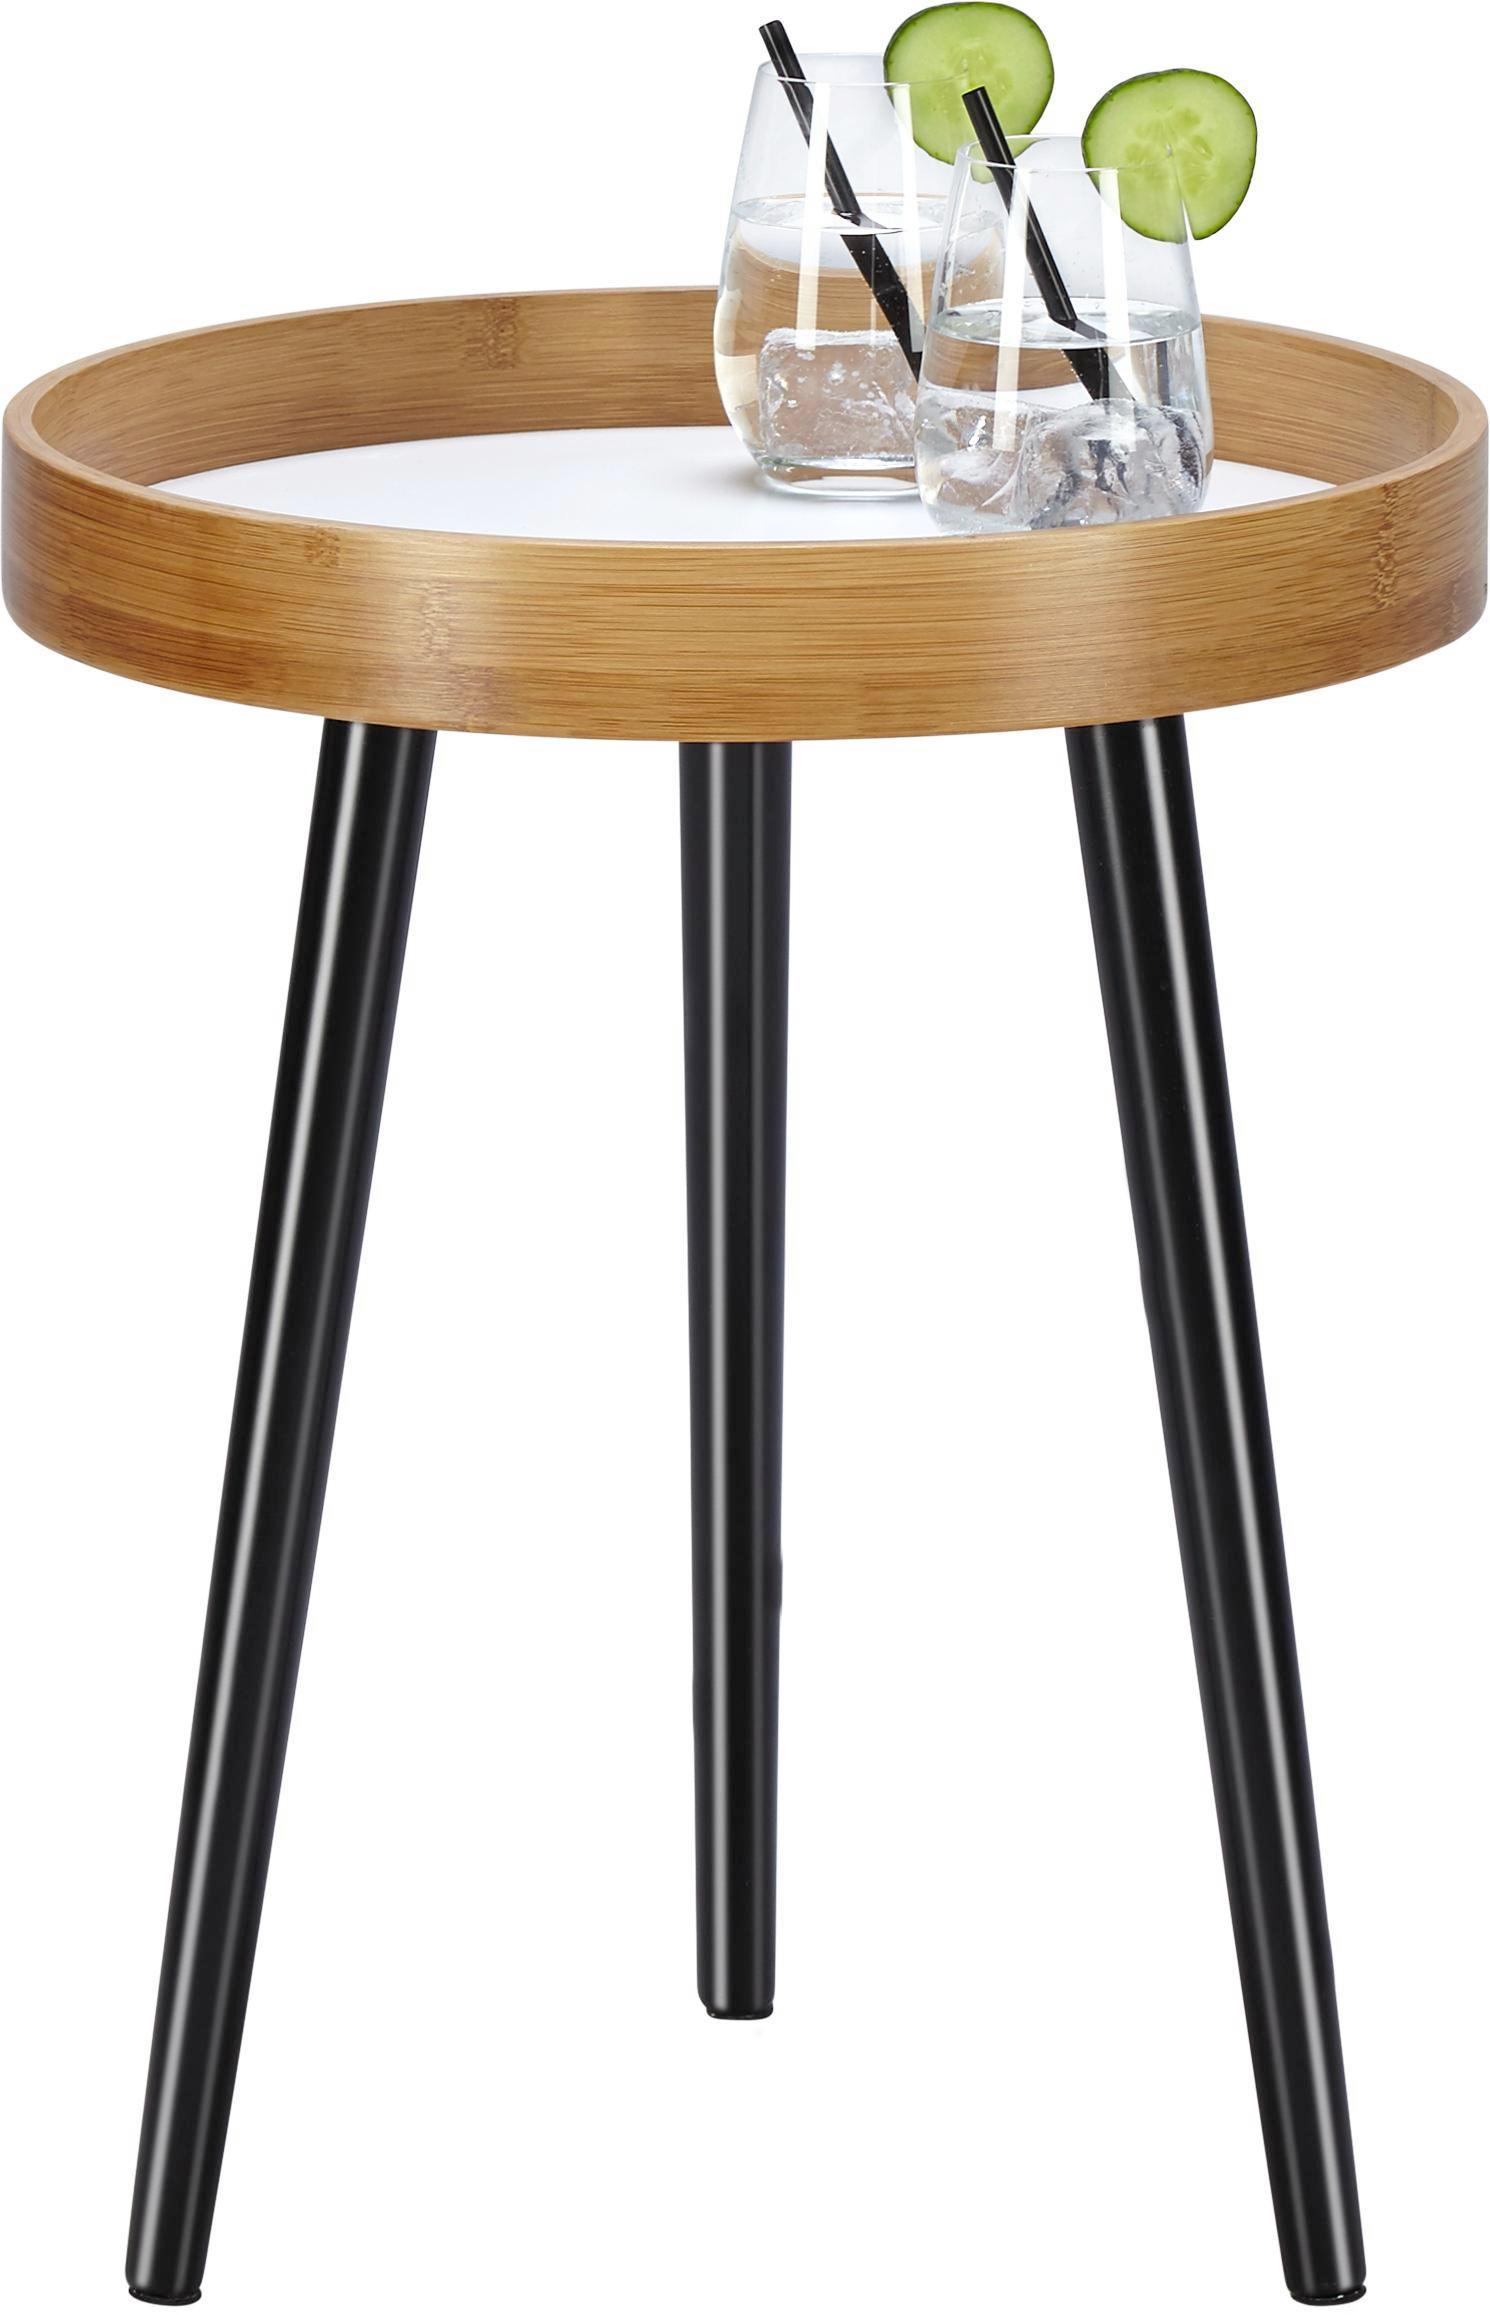 Beistelltisch Dana Ø40cm - Schwarz/Braun, MODERN, Holz (40/50cm) - MÖMAX modern living